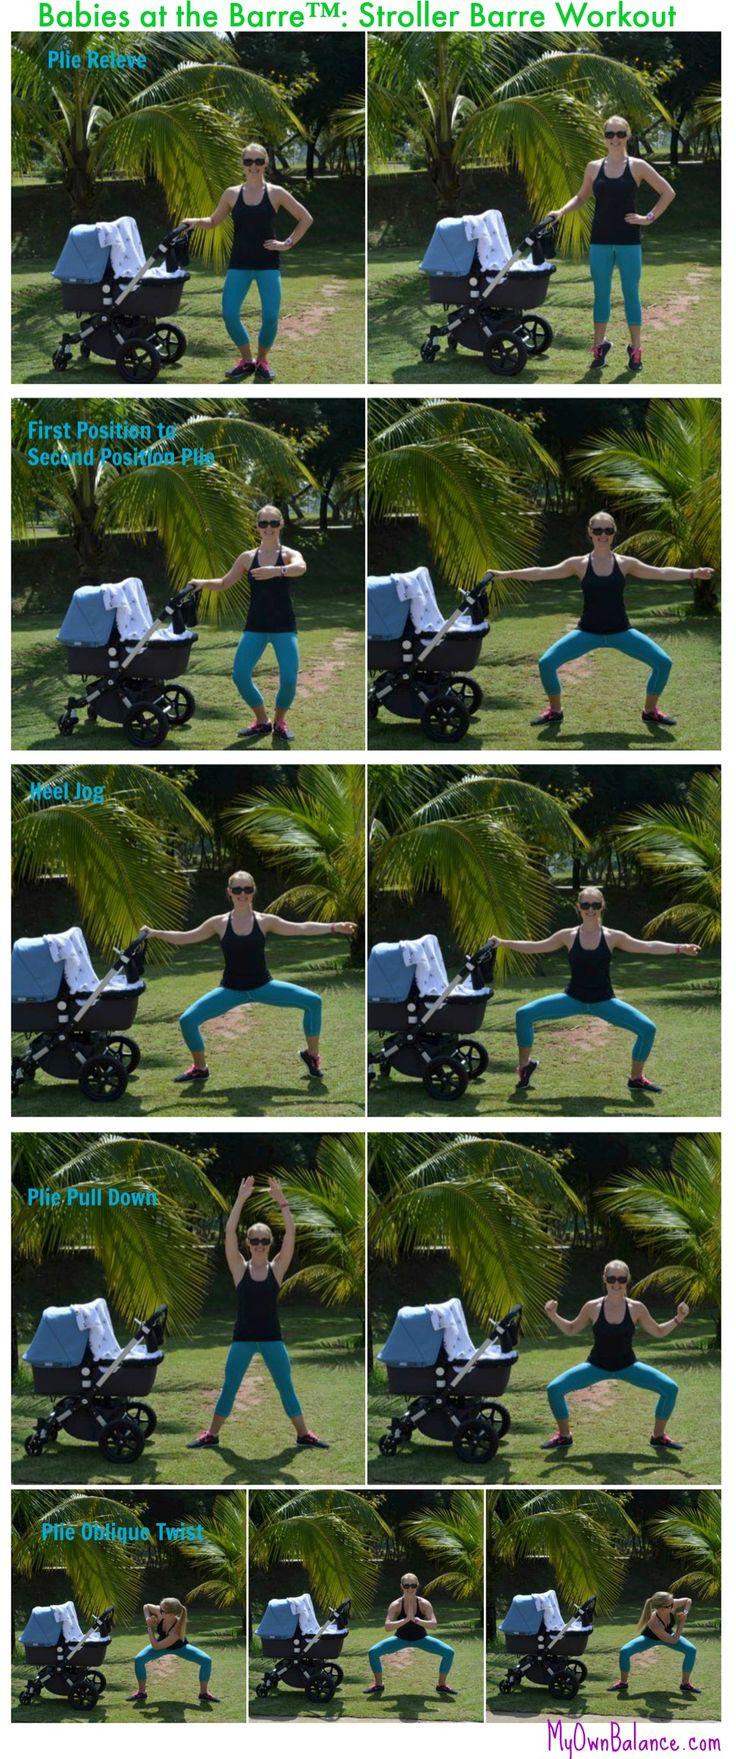 Babies at the Barre™:: stroller barre side barre